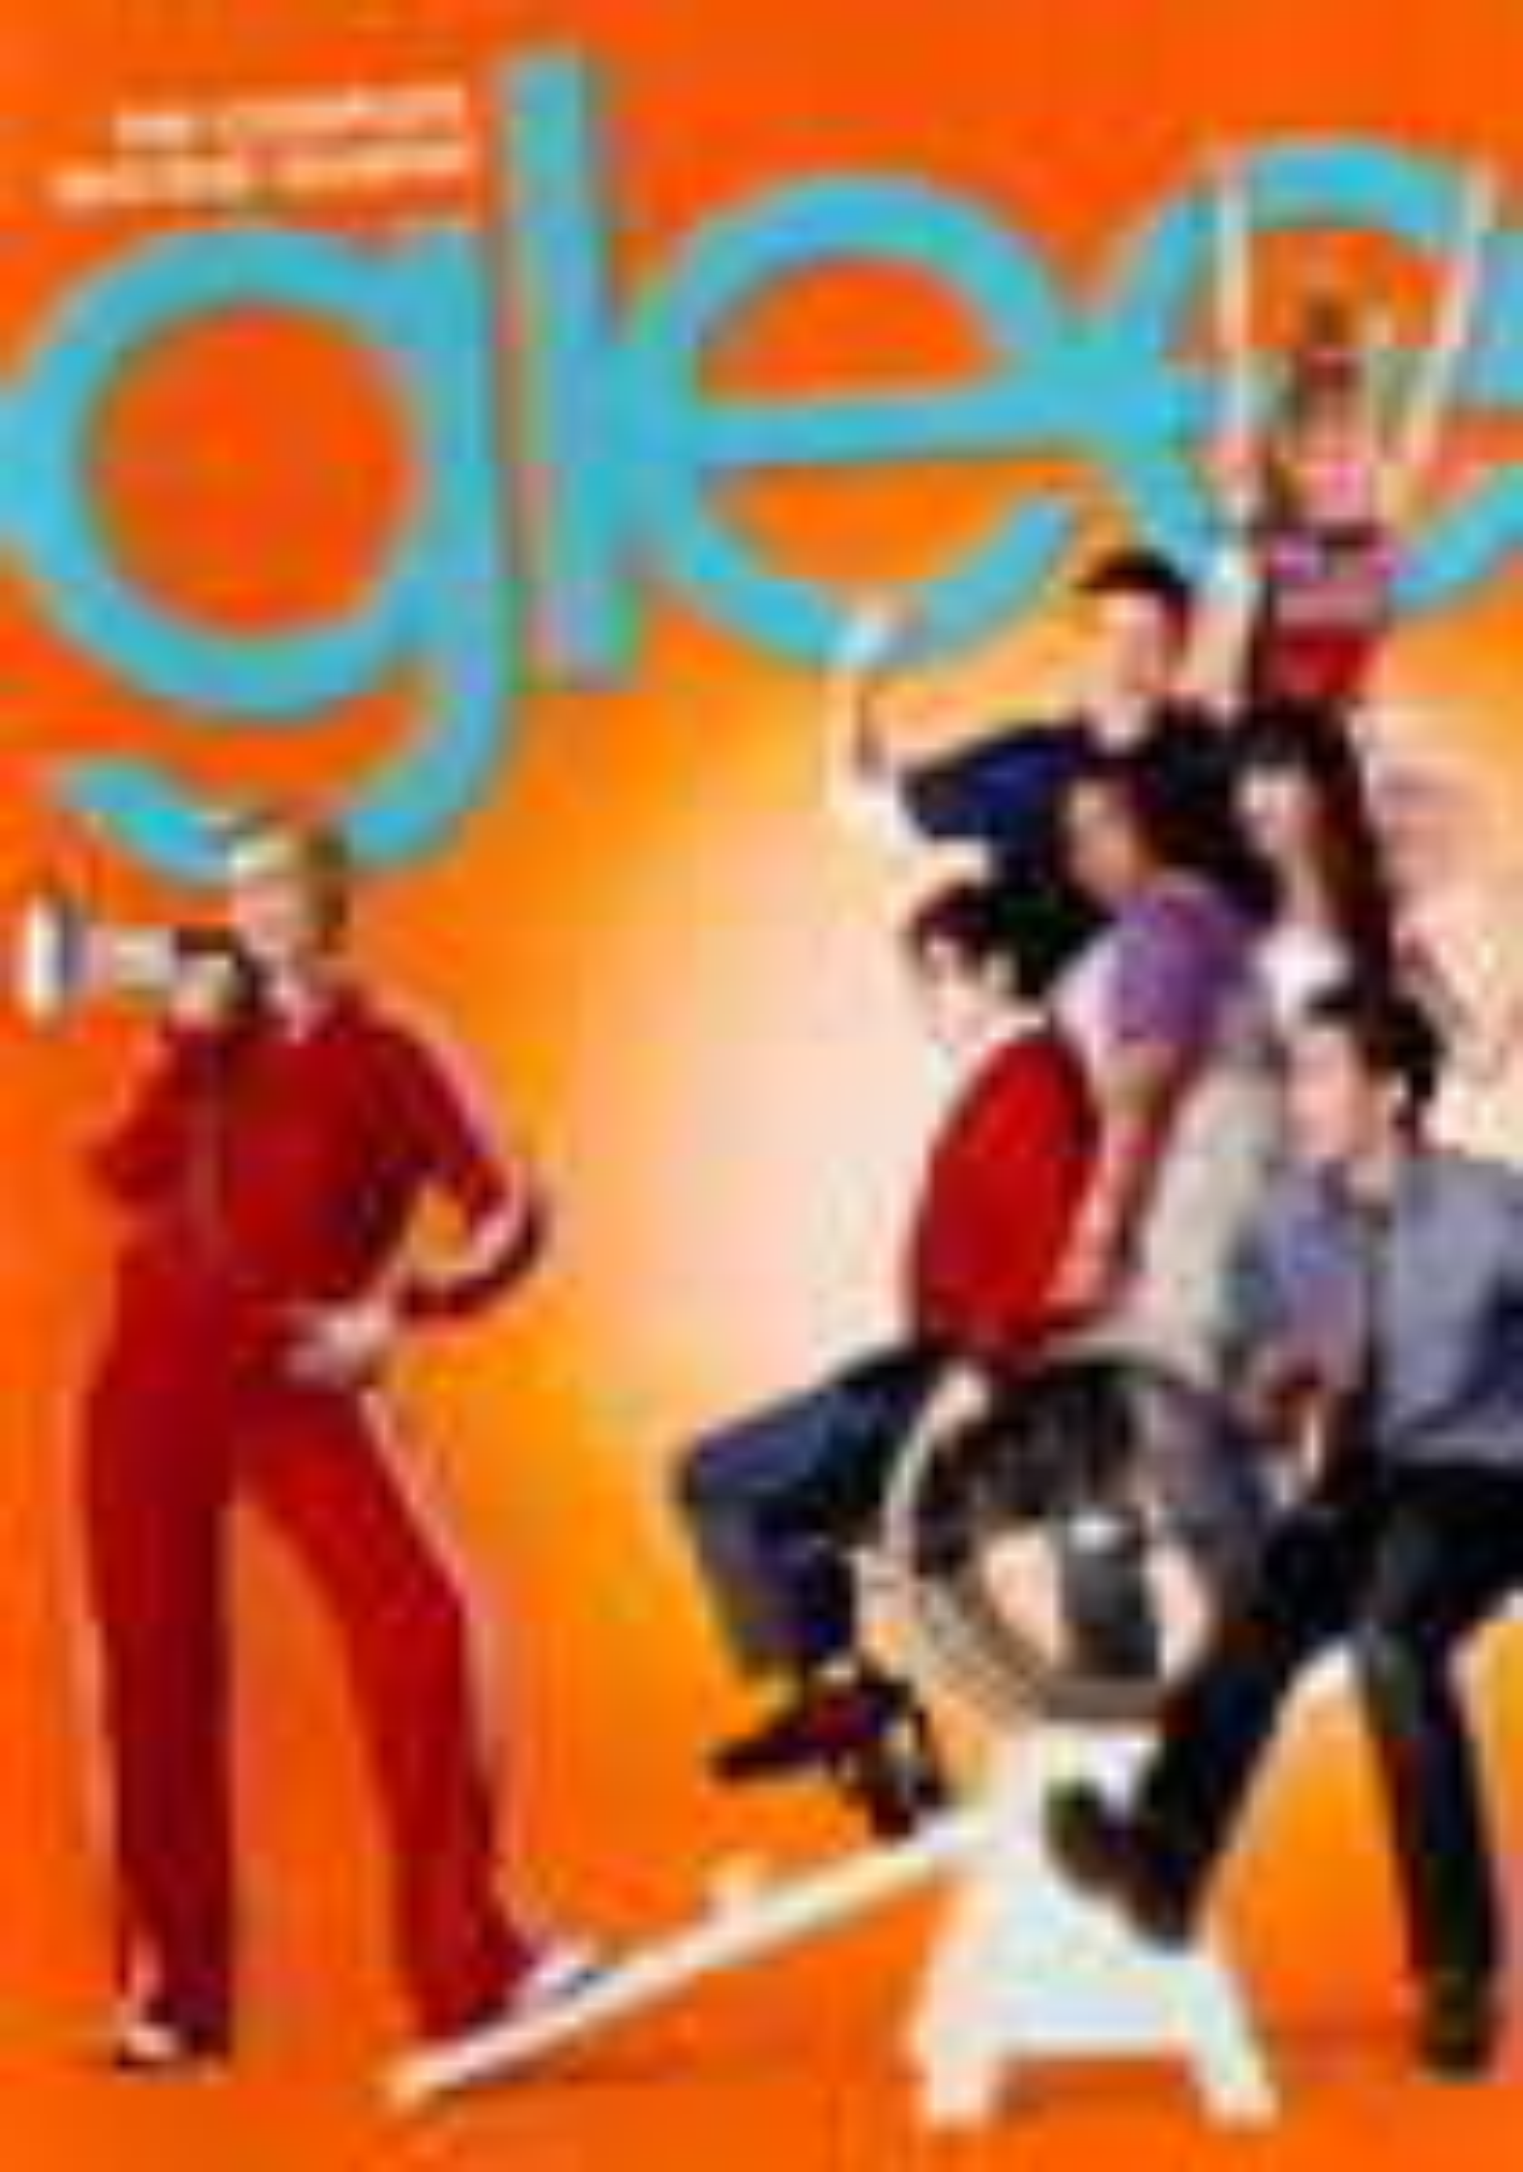 Glee: The Complete Second Season [6 Discs] (dvd) 3039155